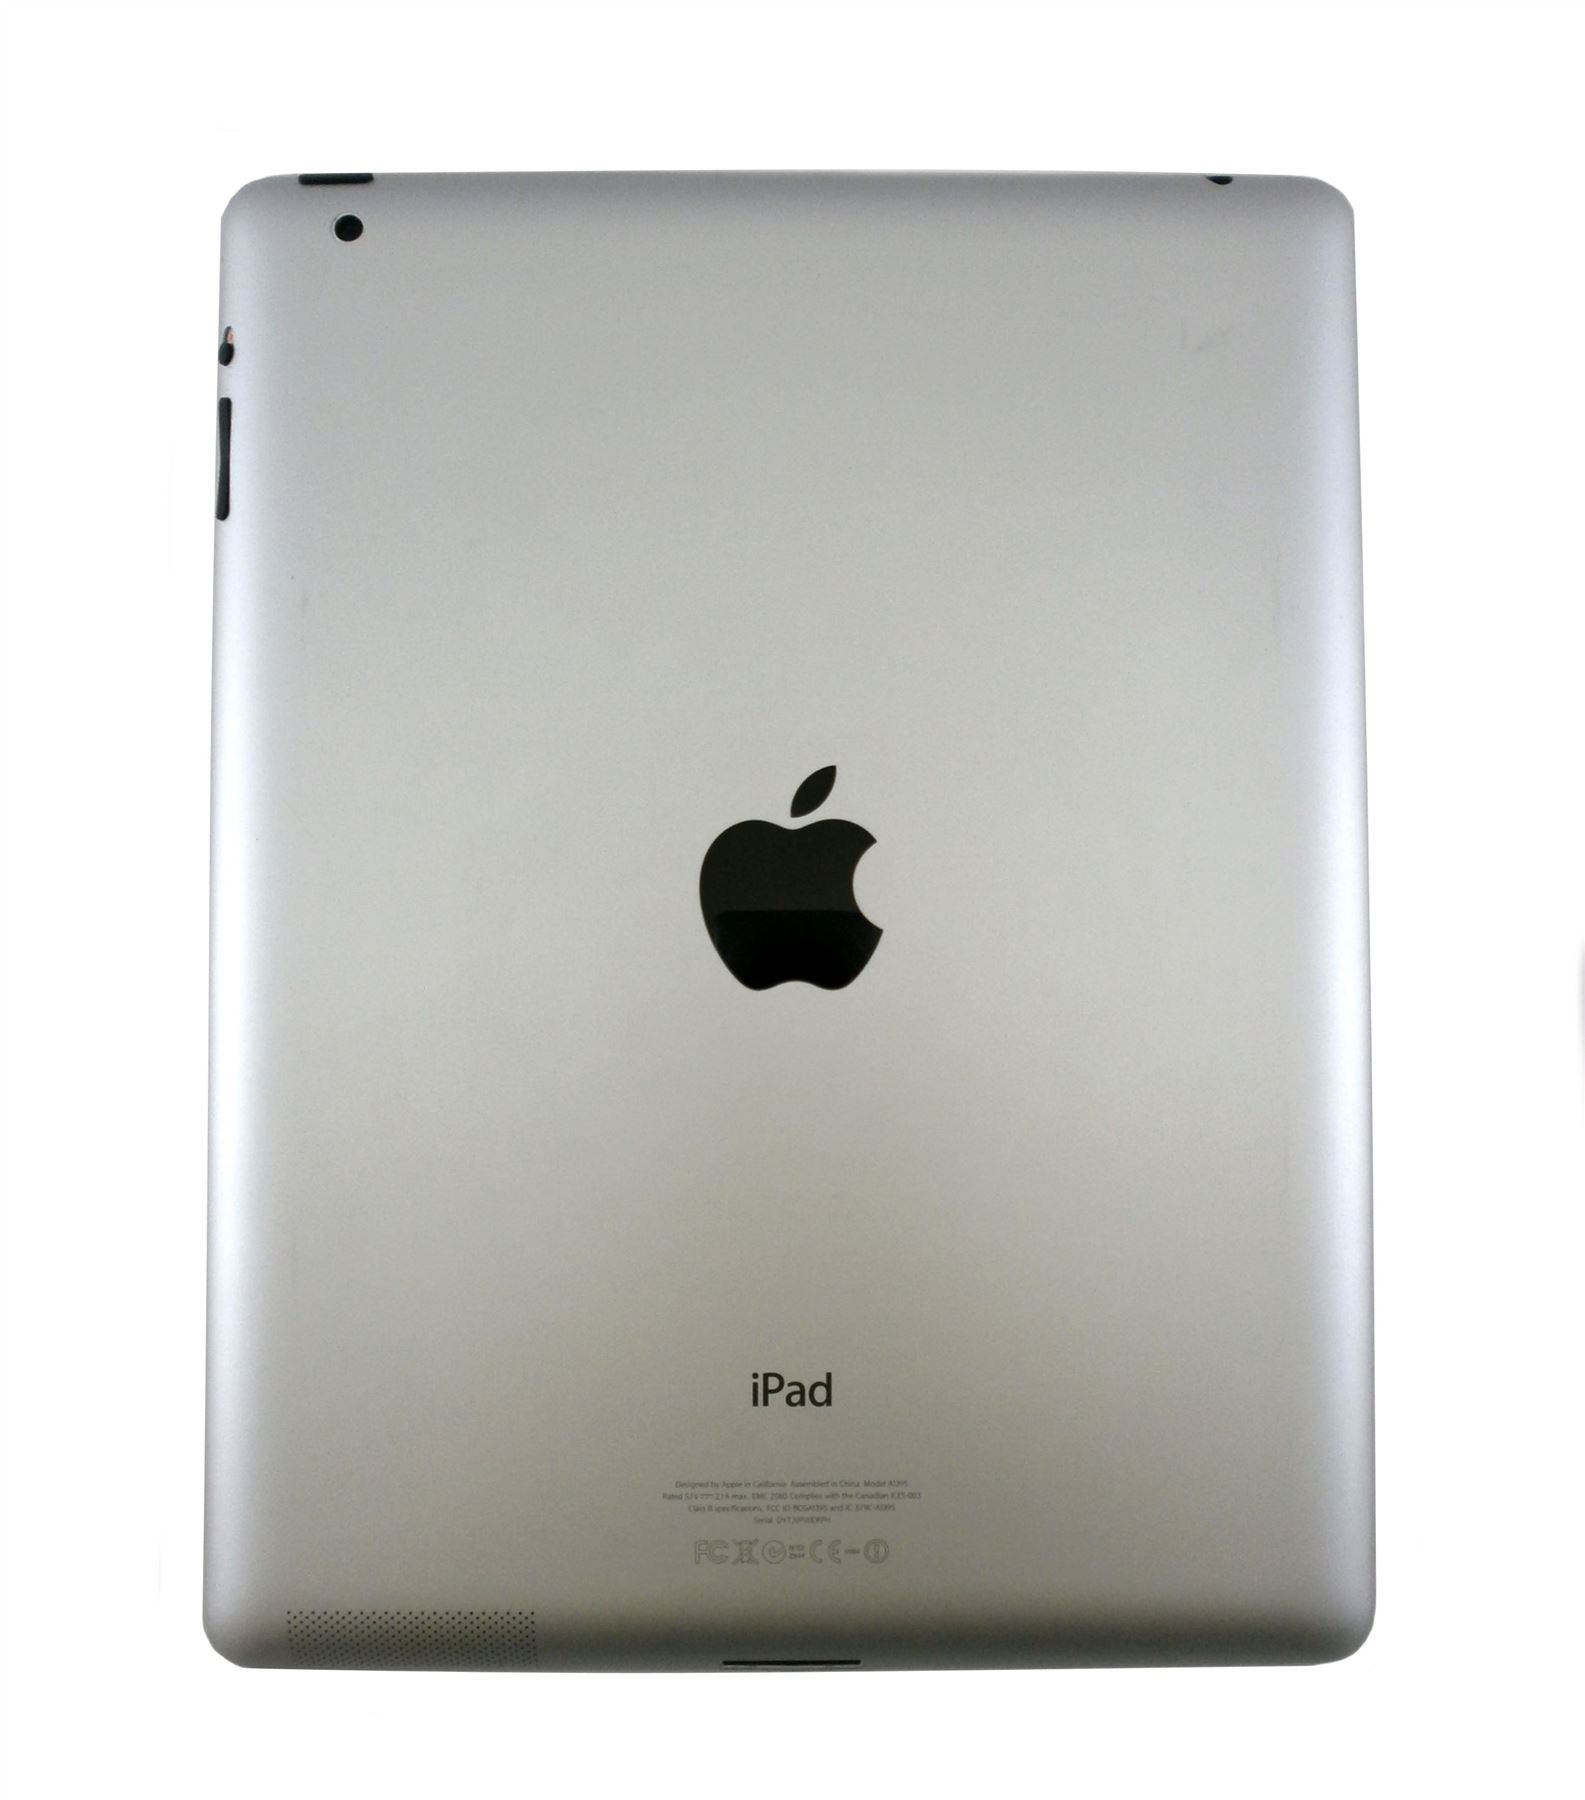 Apple Ipad 2 16gb 32gb 64gb 128gb Wifi Celllular Black